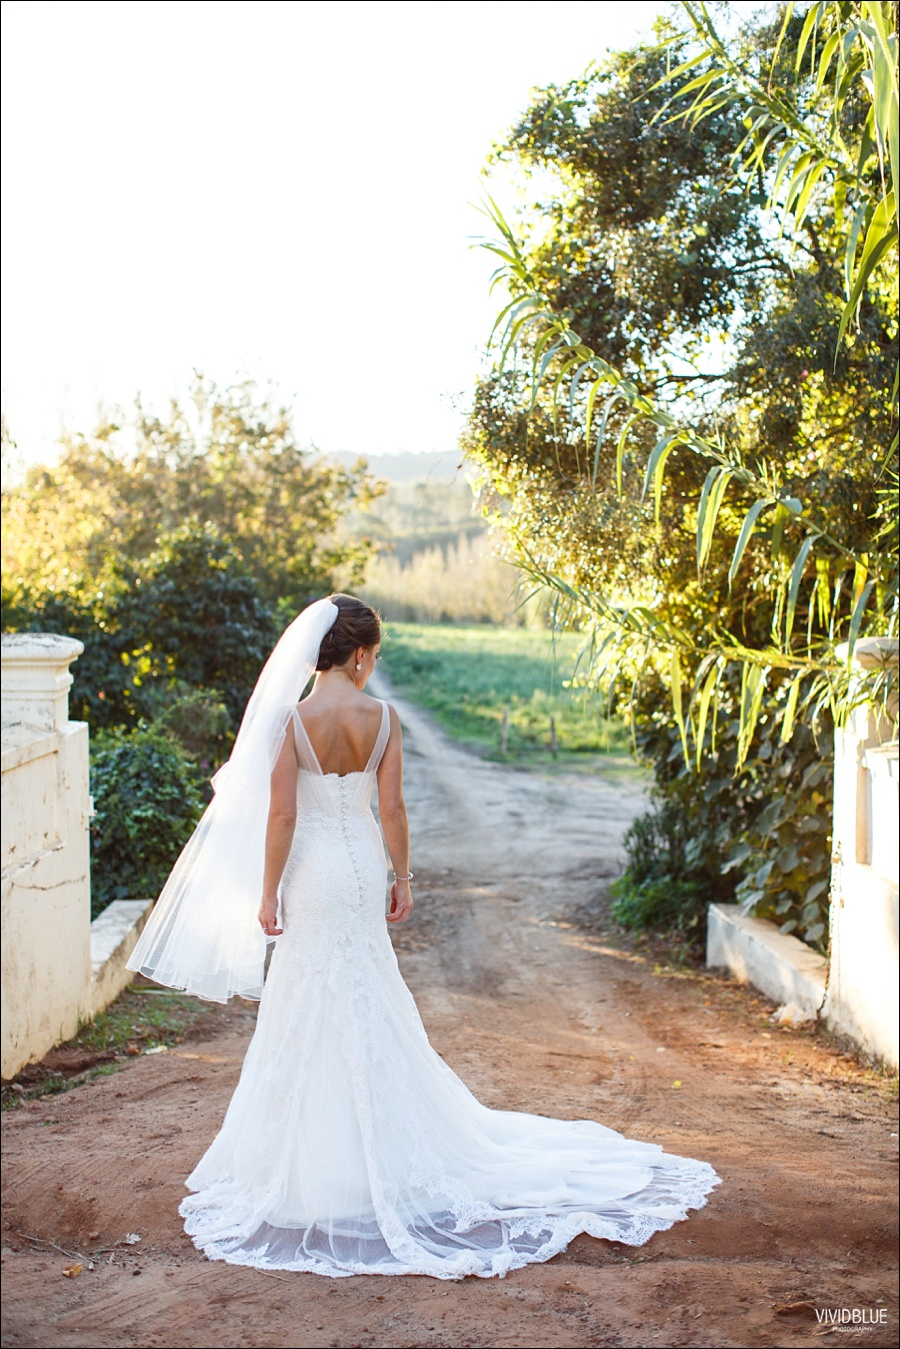 VividBlue-philip-anlika-kleinevalleij-wedding082